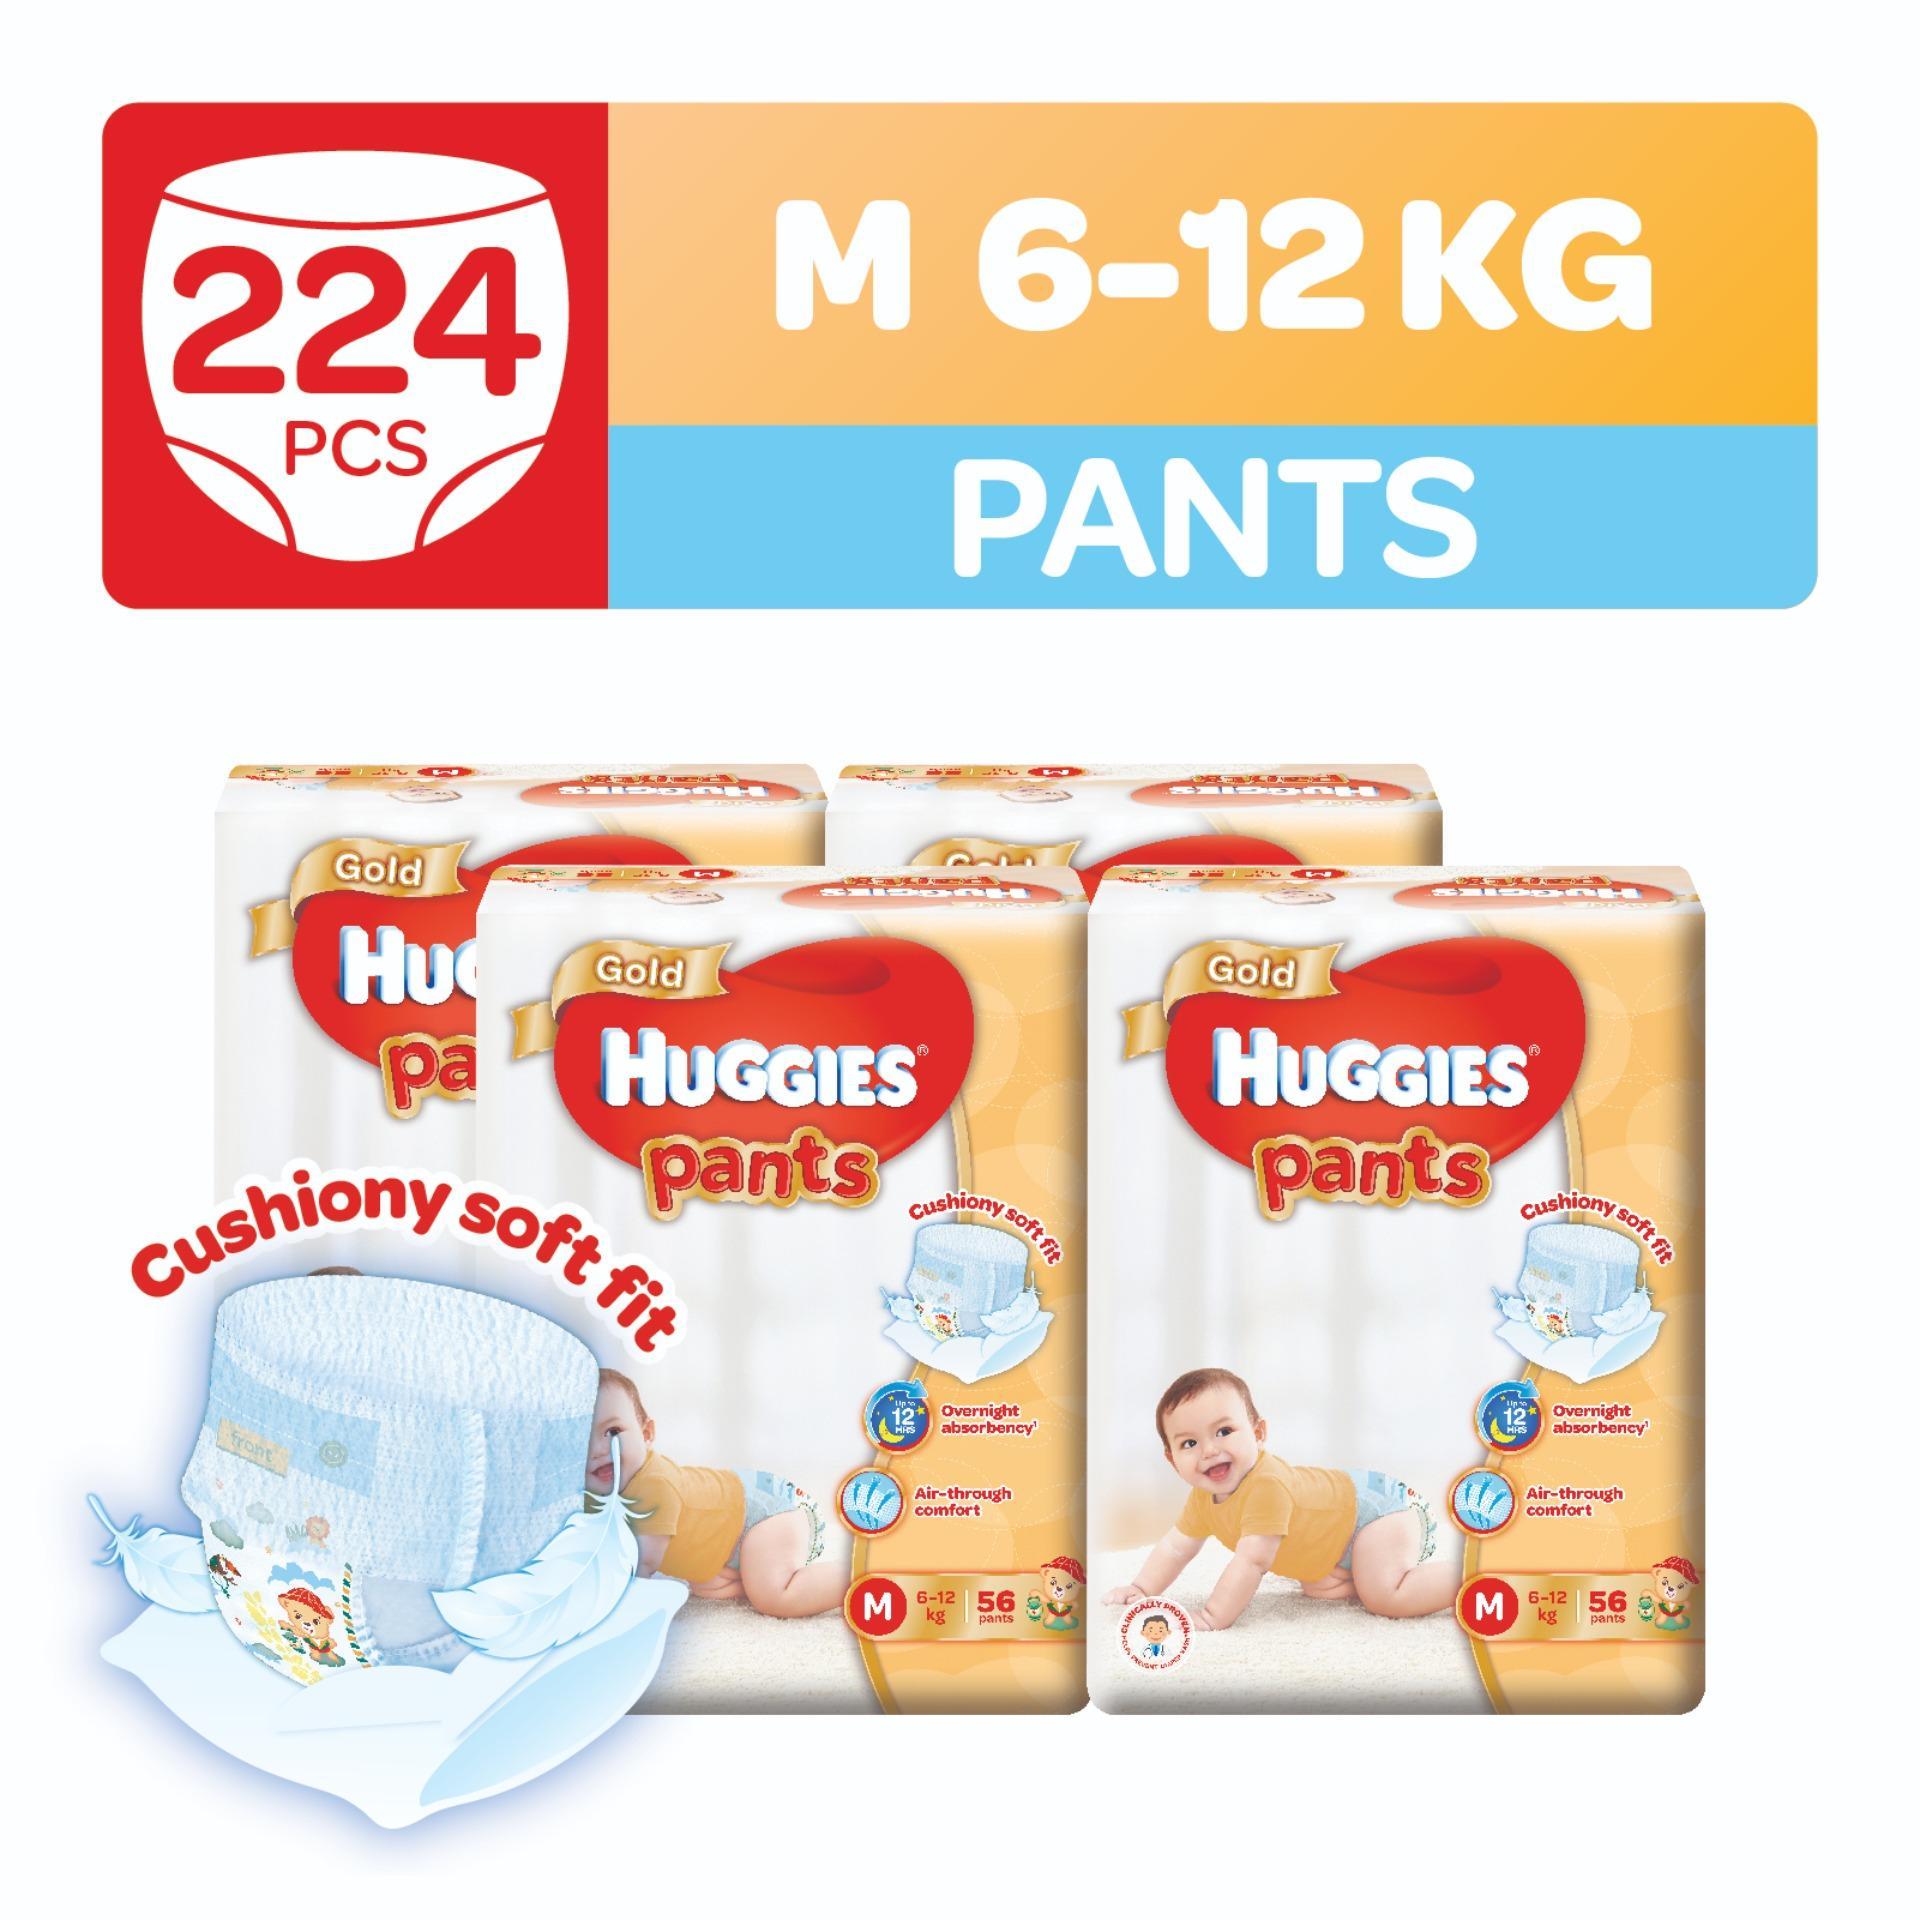 Shop For Huggies Gold Pullup Pants M 56Pcs X 4 Packs